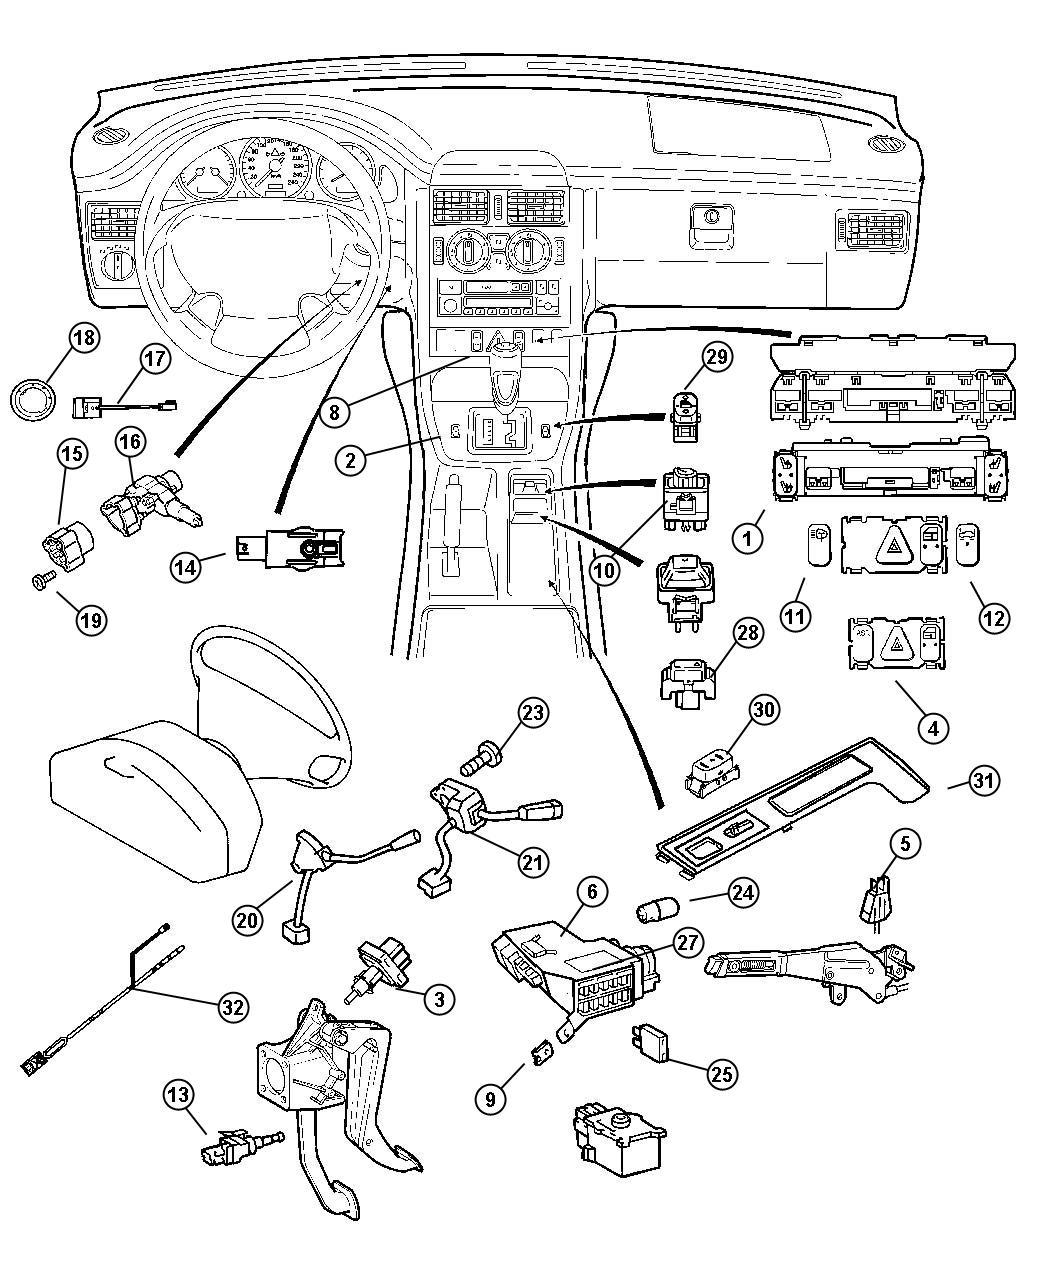 2007 chrysler crossfire switch headlamp lmn yac yad. Black Bedroom Furniture Sets. Home Design Ideas